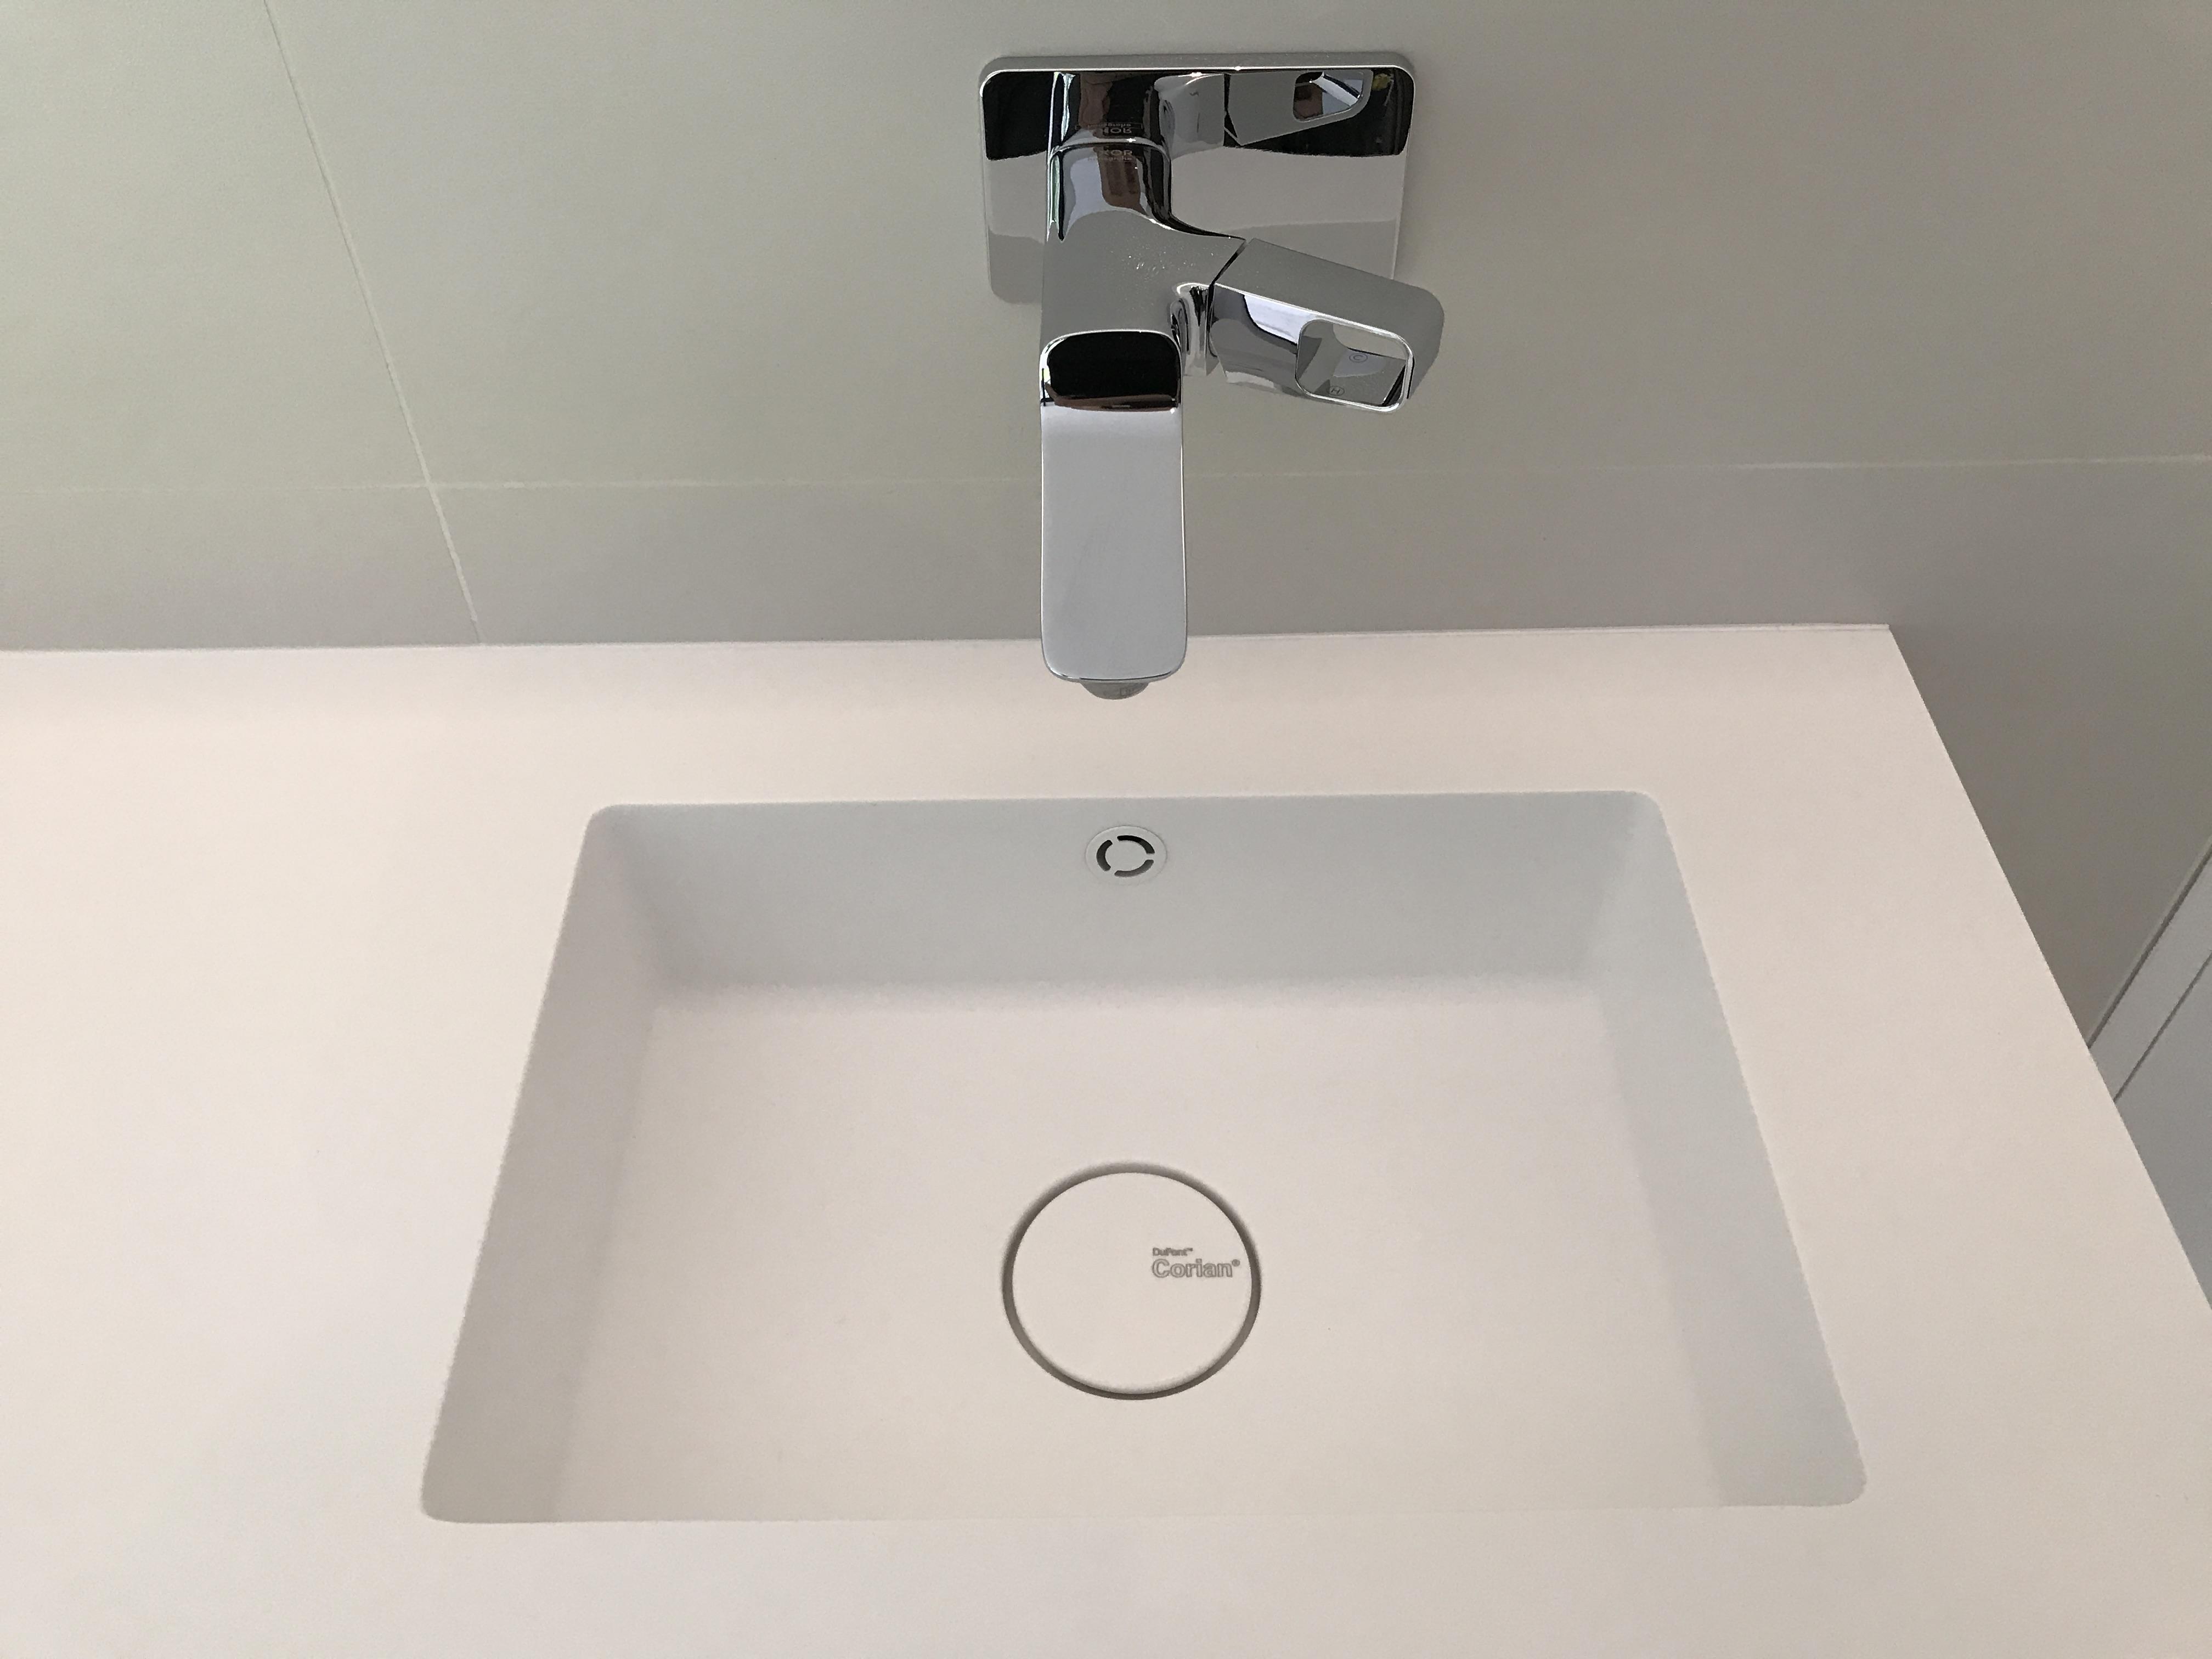 Corian Badkamer Wanden : Nieuwe badkamer te roeselare jd technics